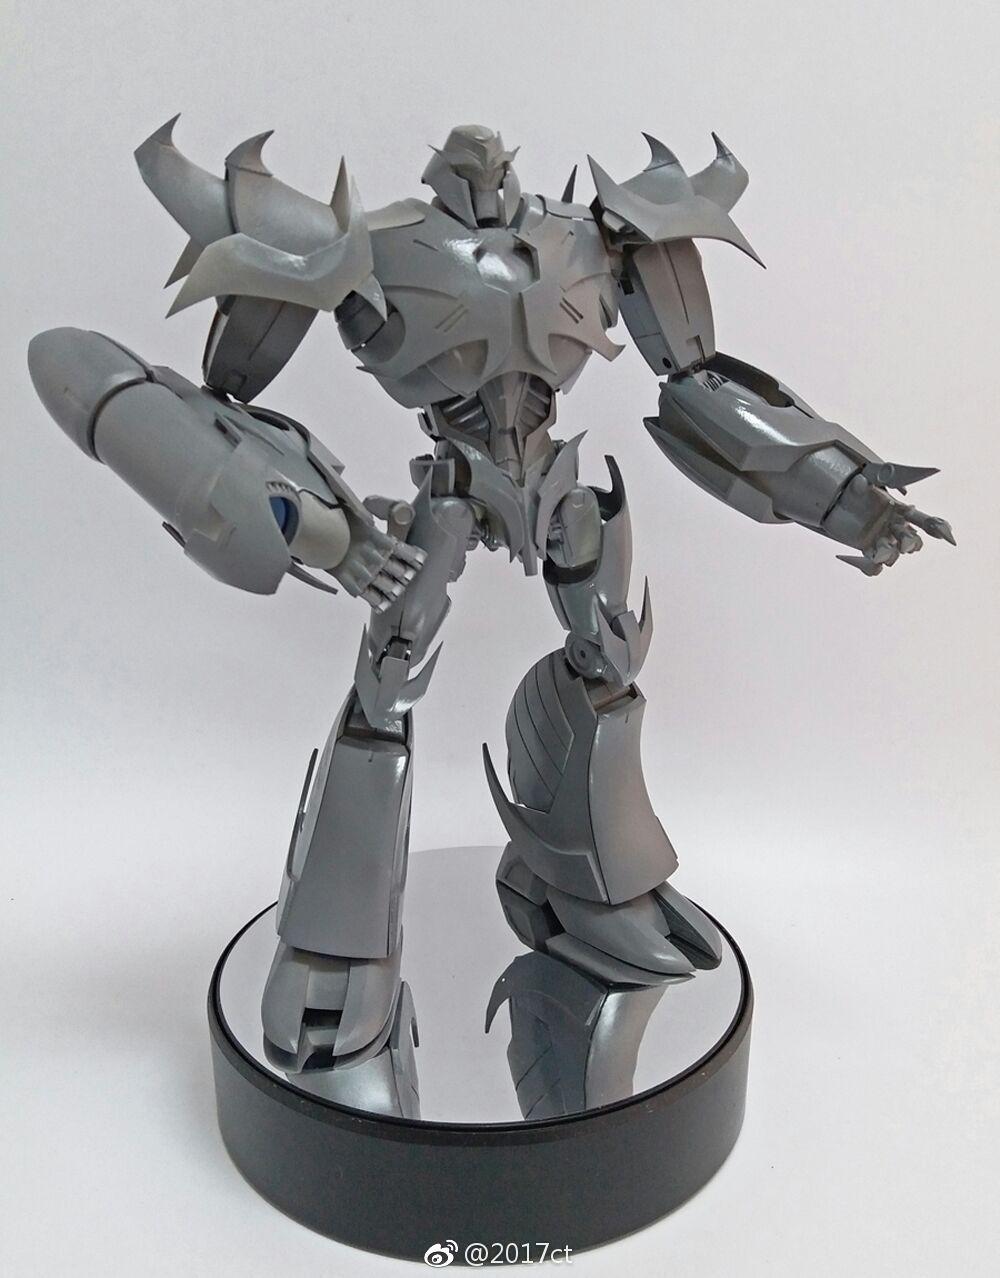 Iron warrior transformers prime megatron action figure prototype transformers news tfw2005 - Transformers prime megatron ...